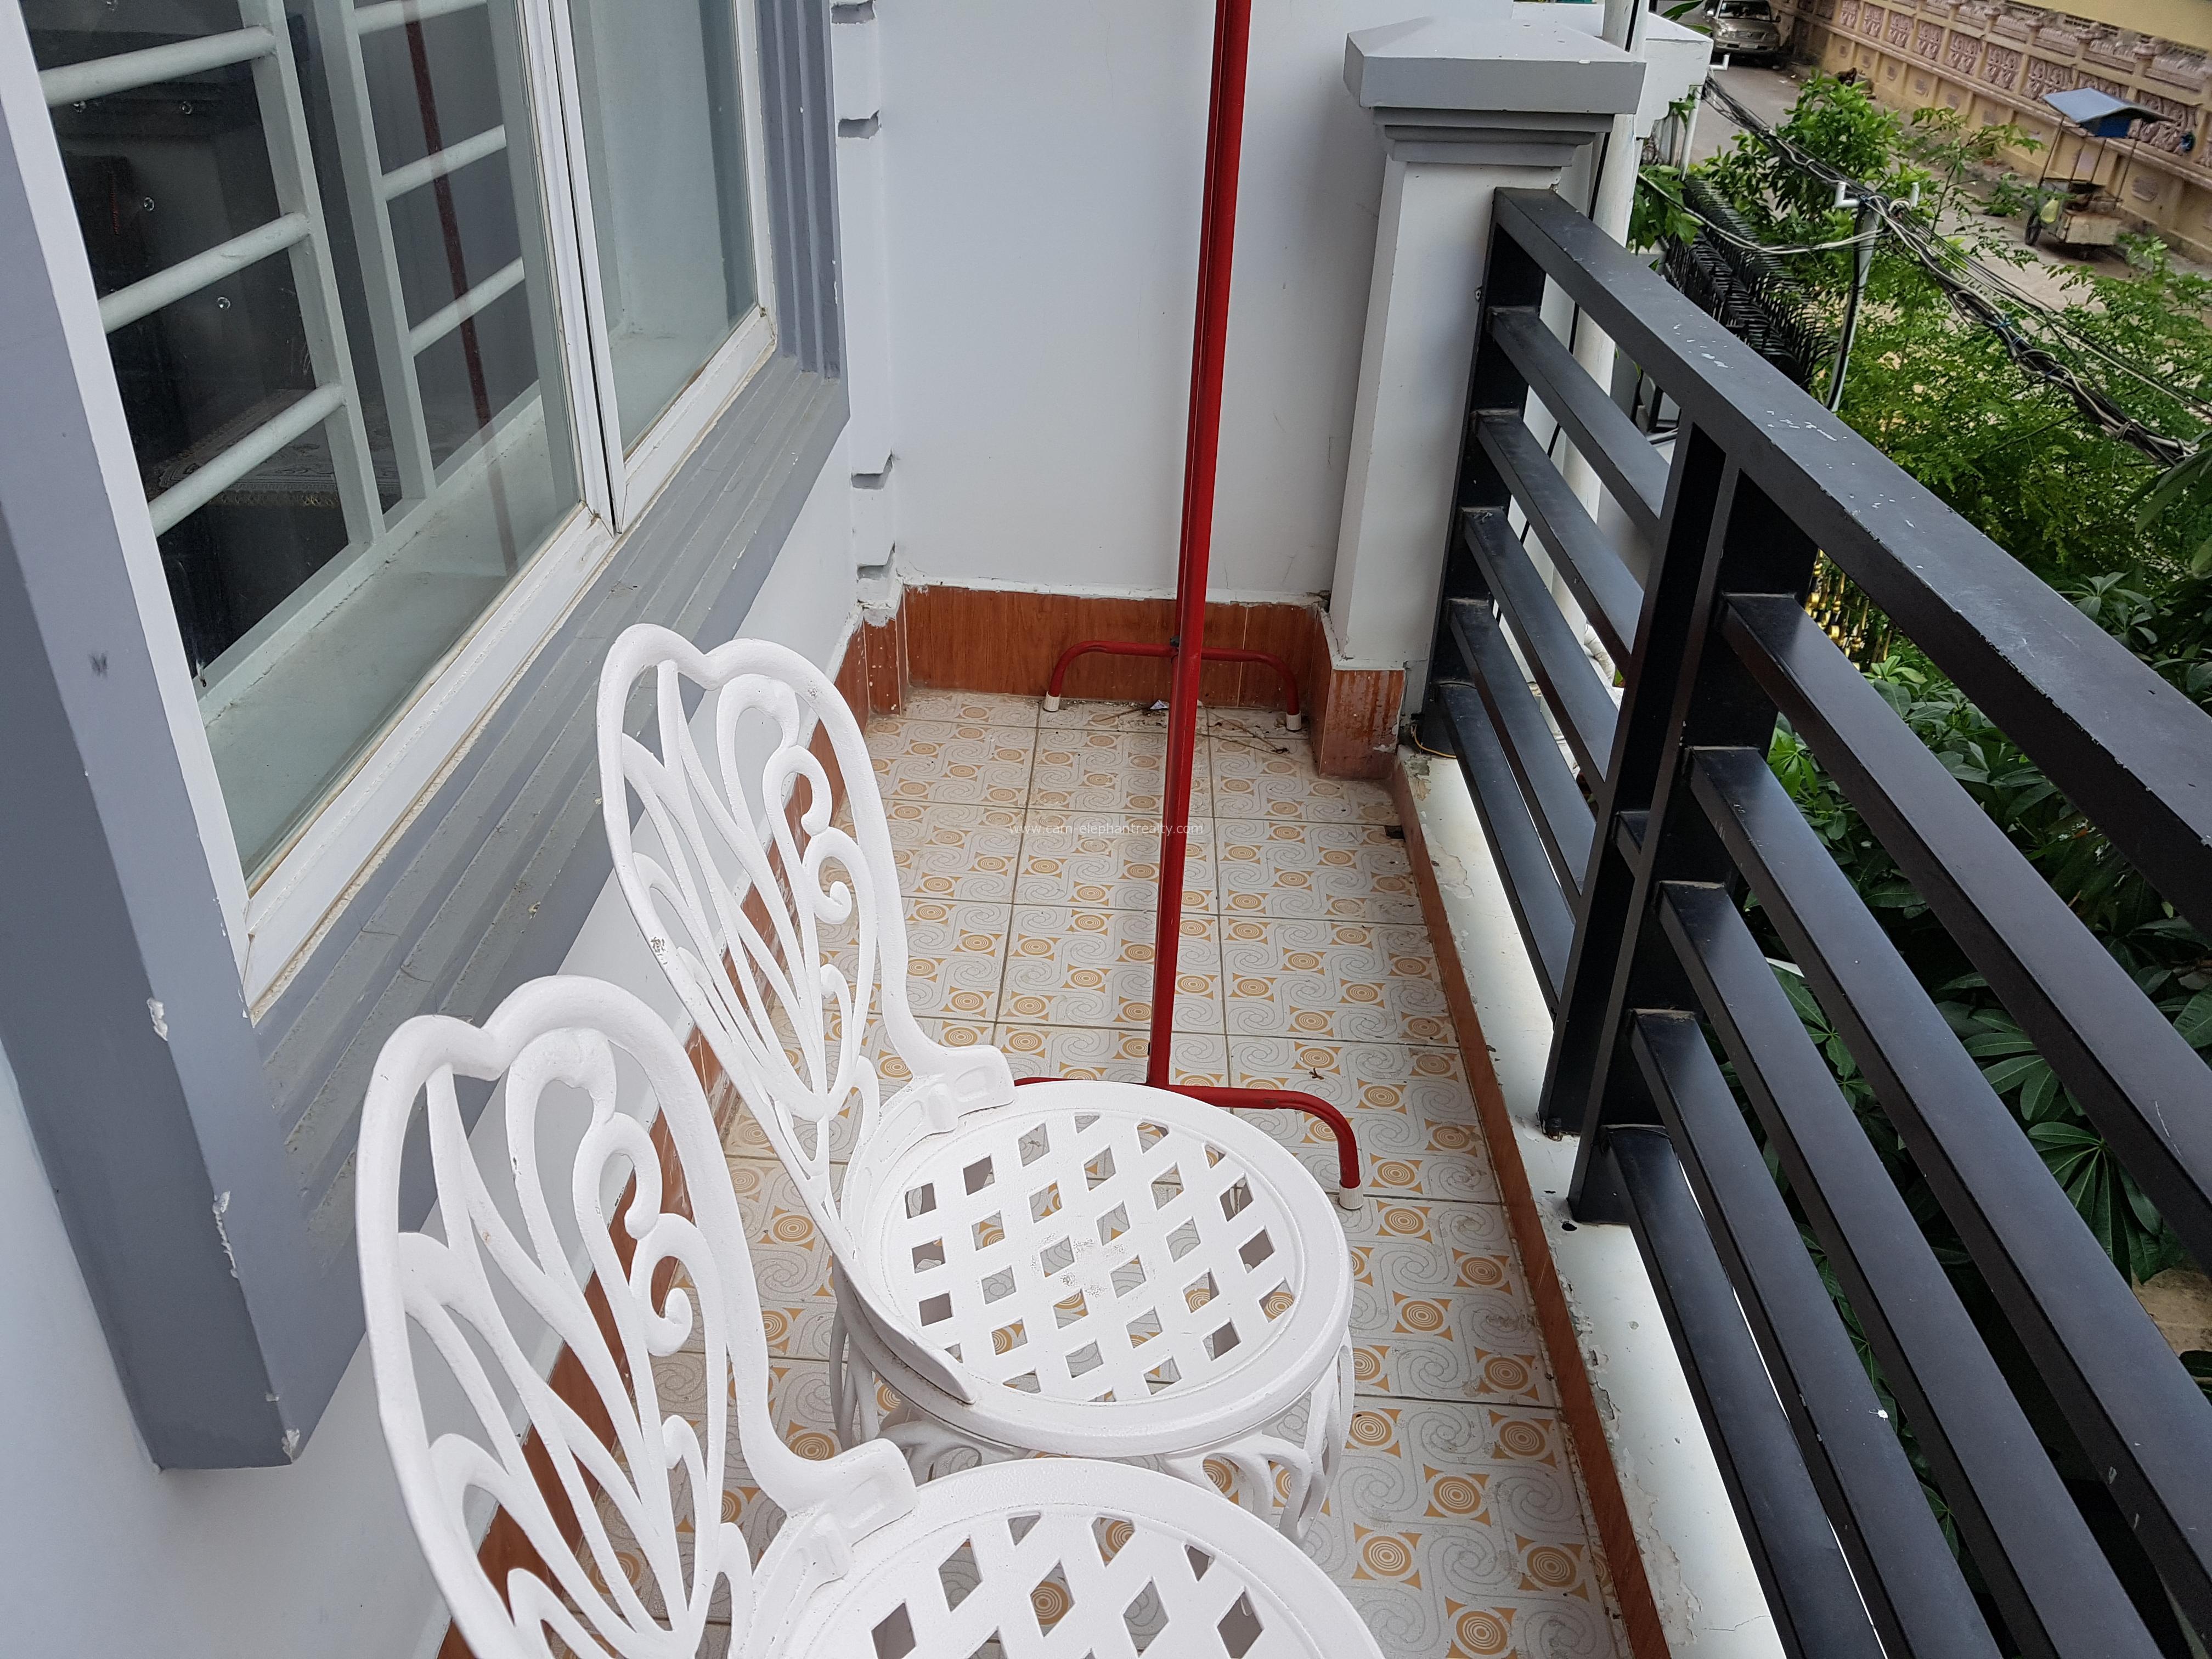 Western Apartment 2Bedroom+2bathroom $400/month near NAGA world